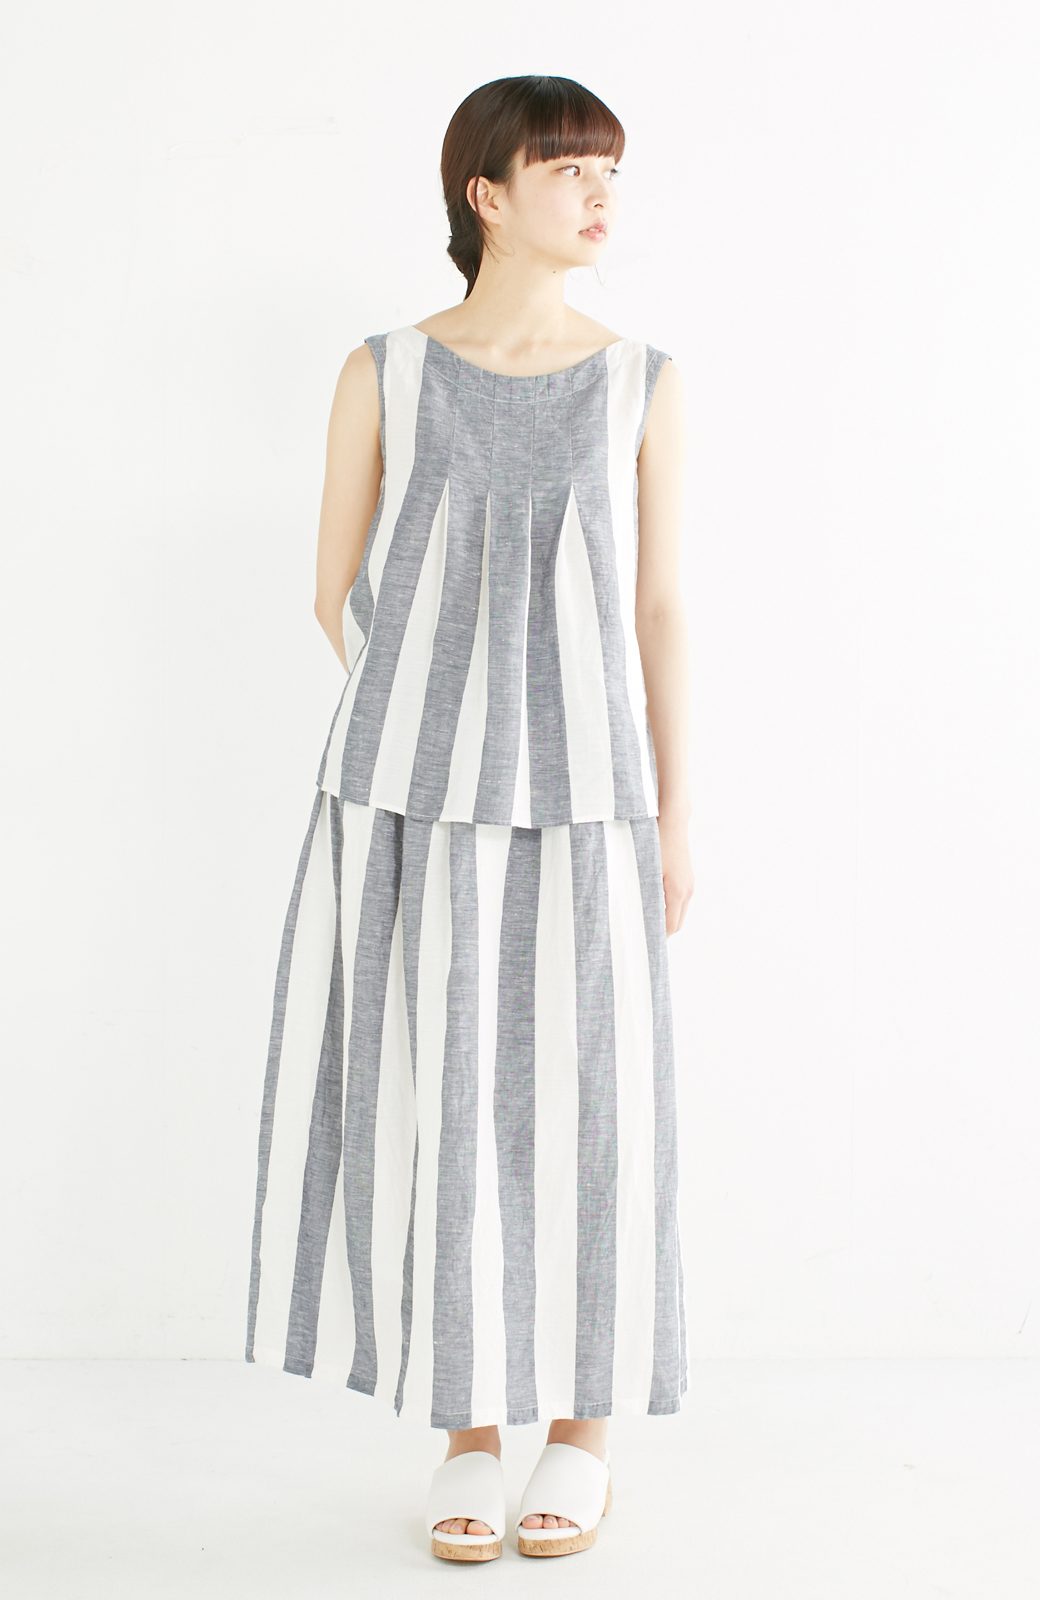 haco! てとひとて miho umezawa ストライプツーピースドレス <ホワイト×ブルー>の商品写真1